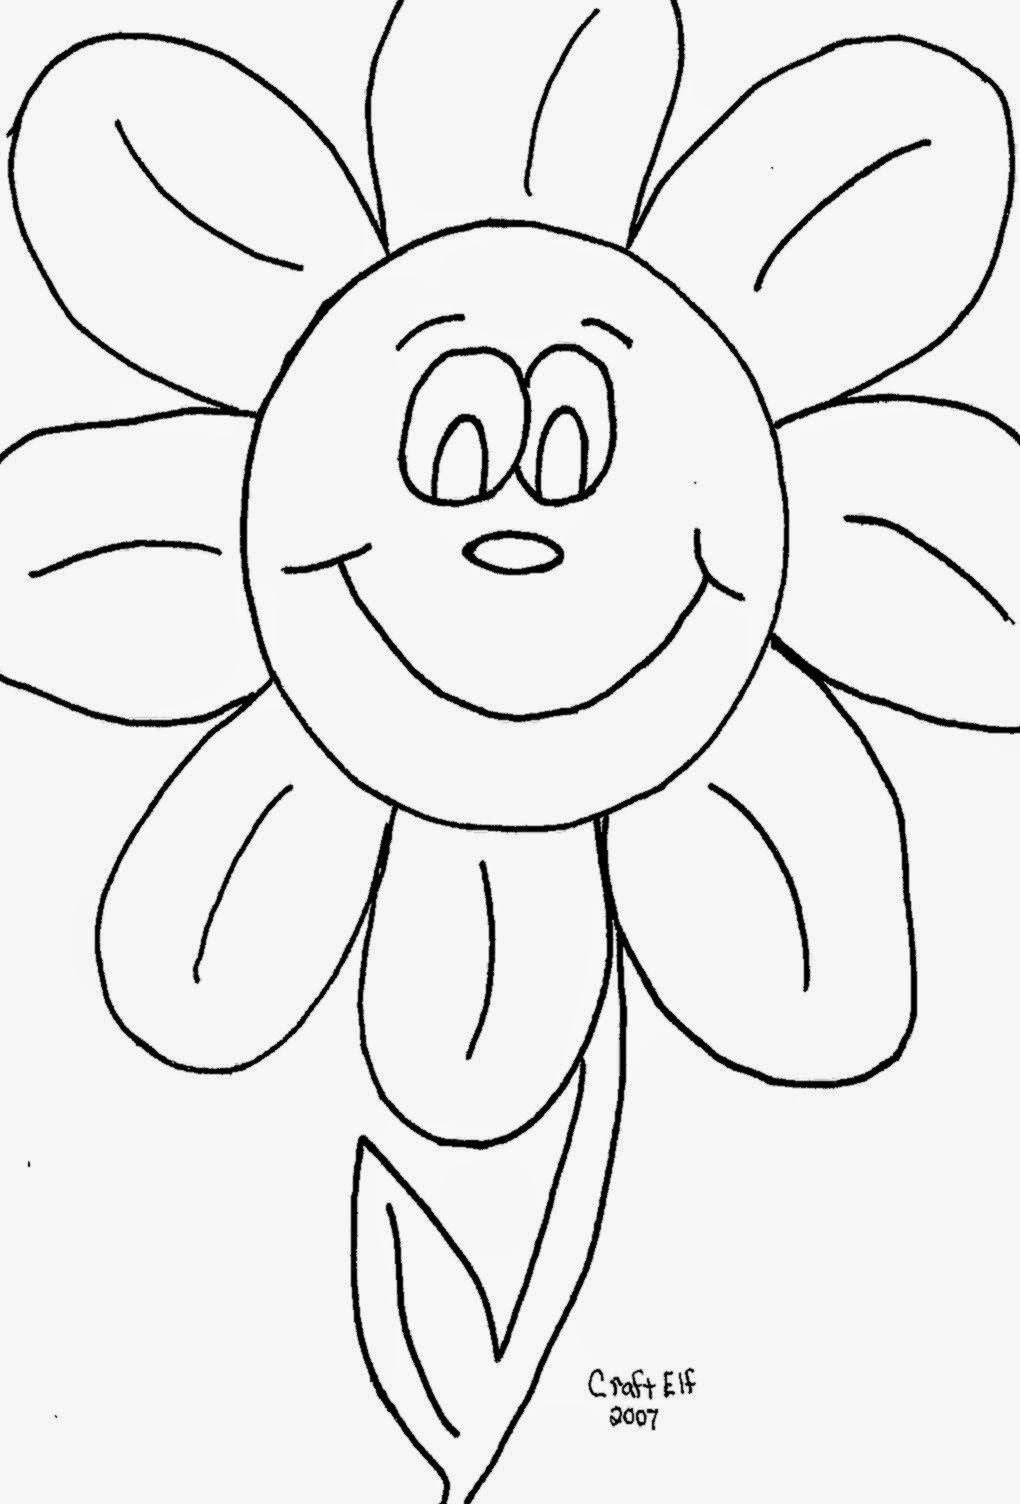 Kindergarten Coloring Pages Aradio